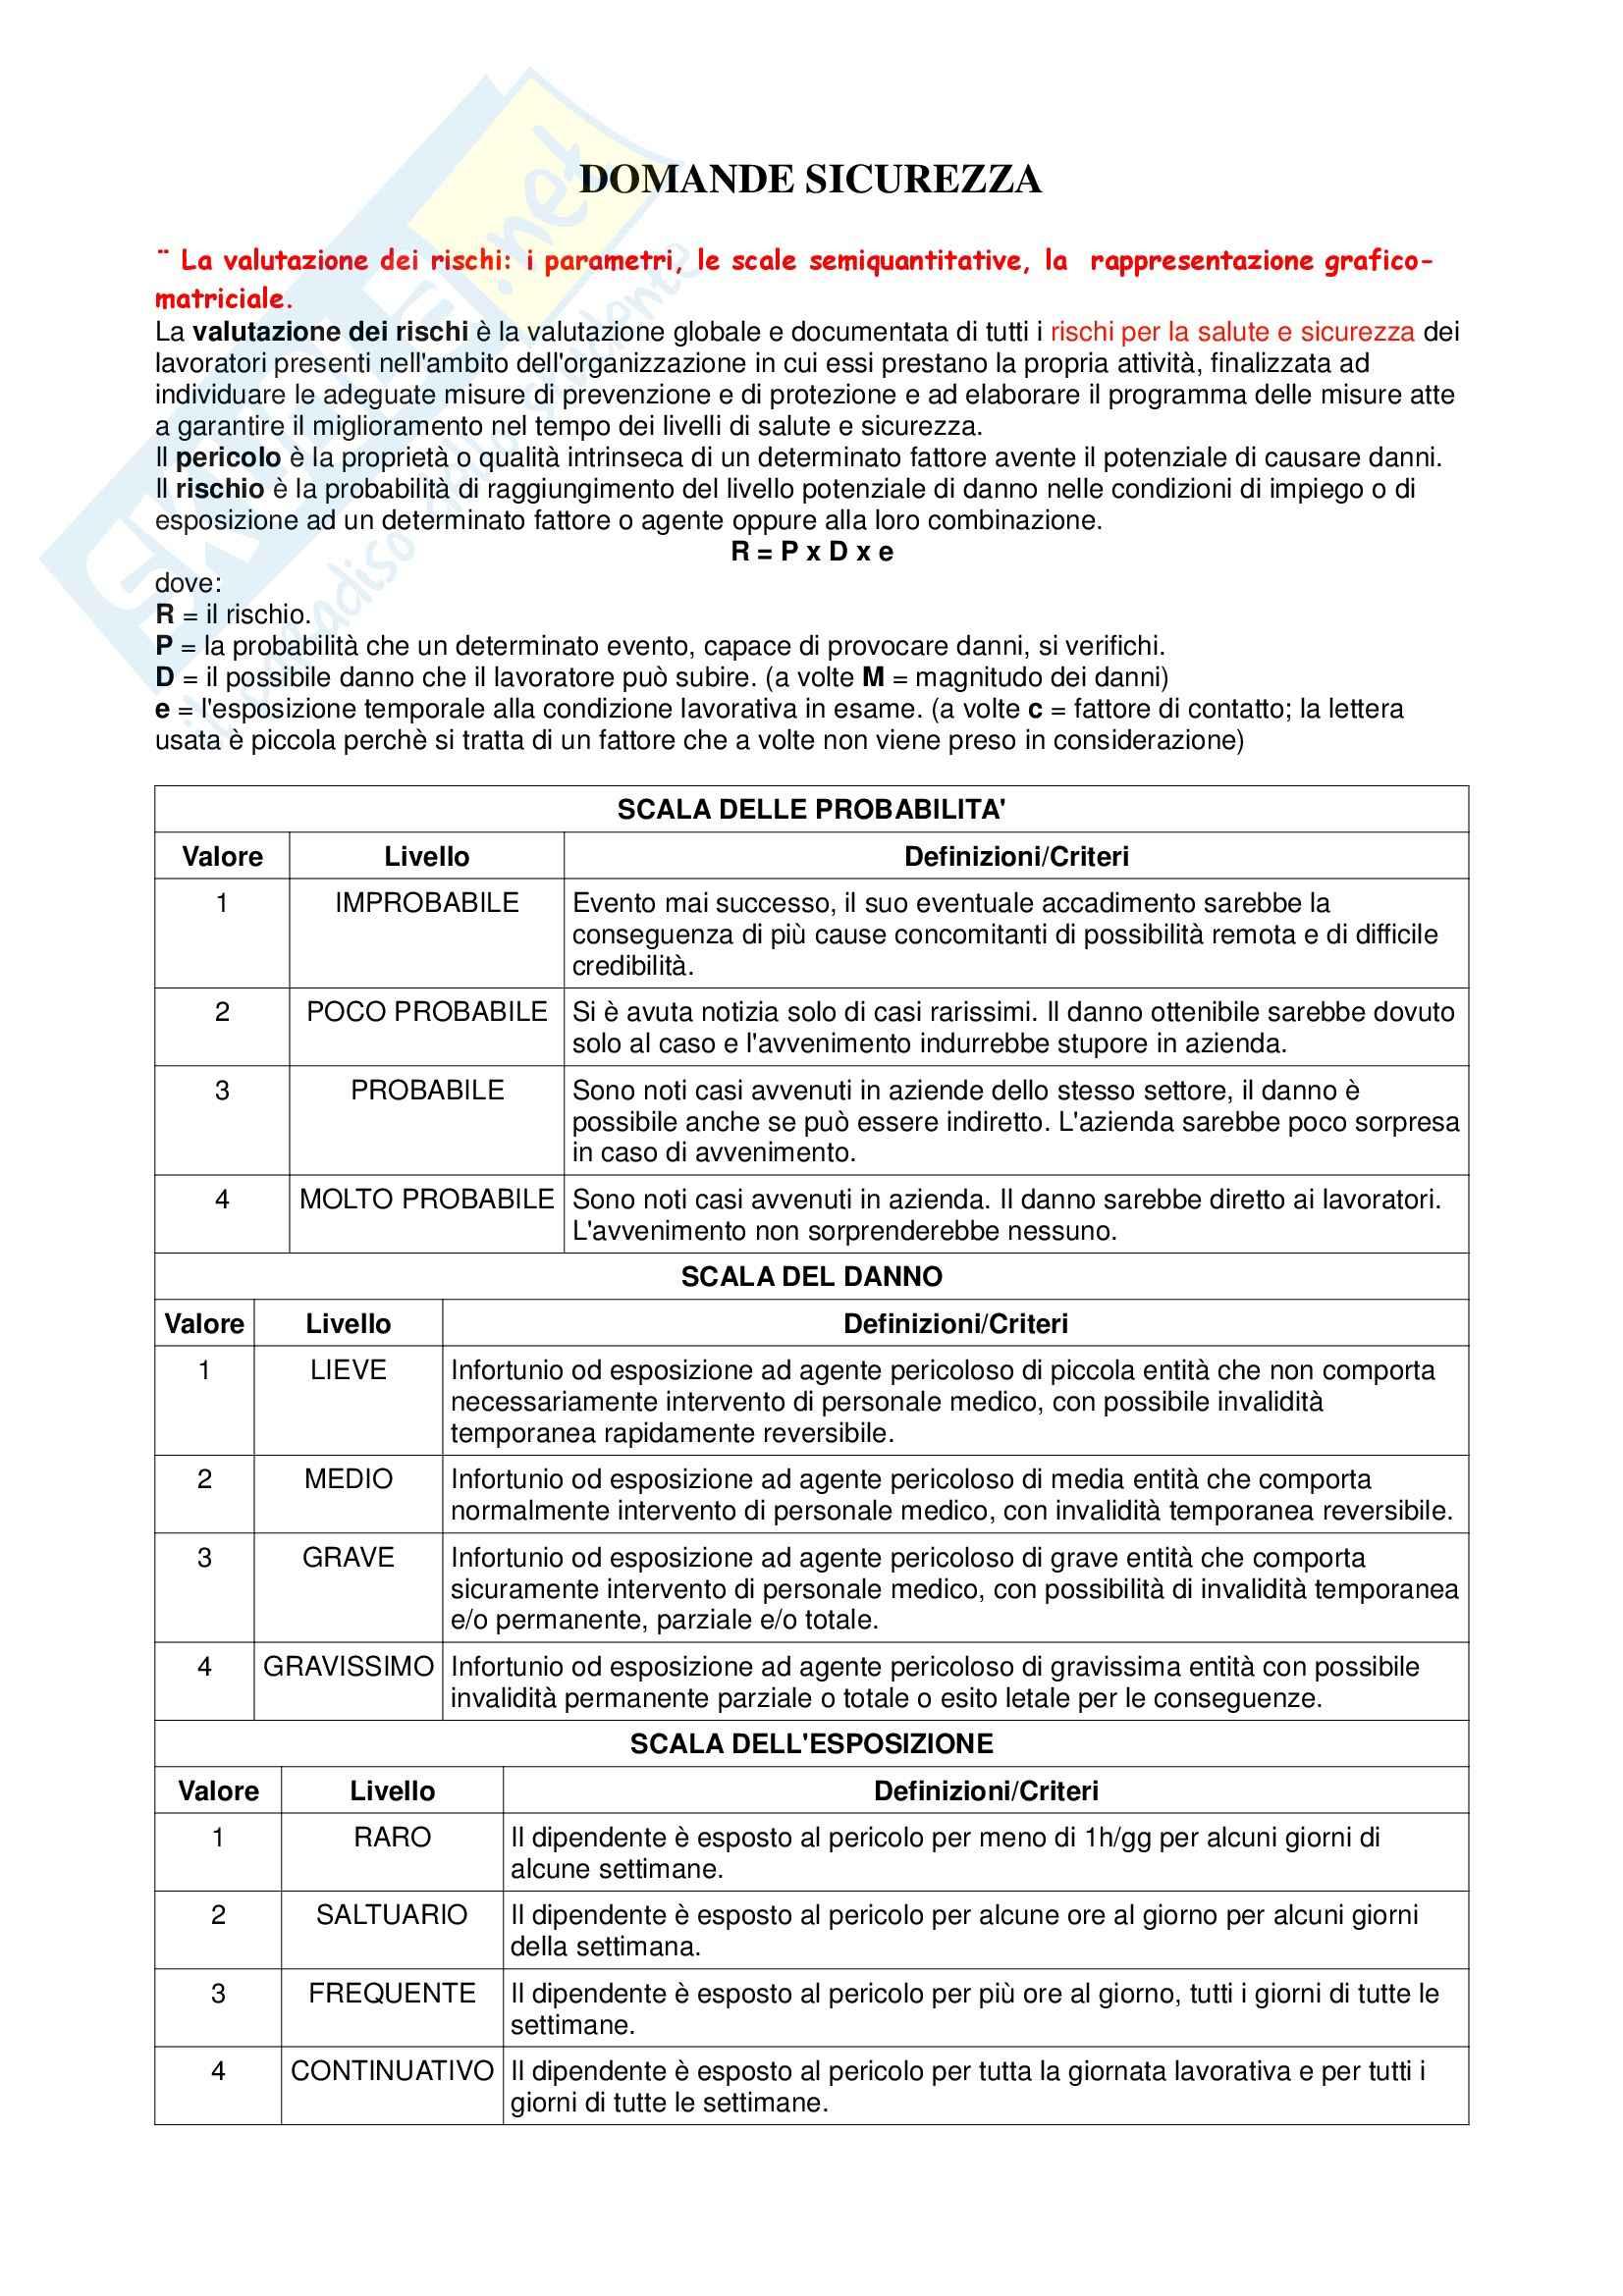 Manutenzione e  sicurezza - Appunti